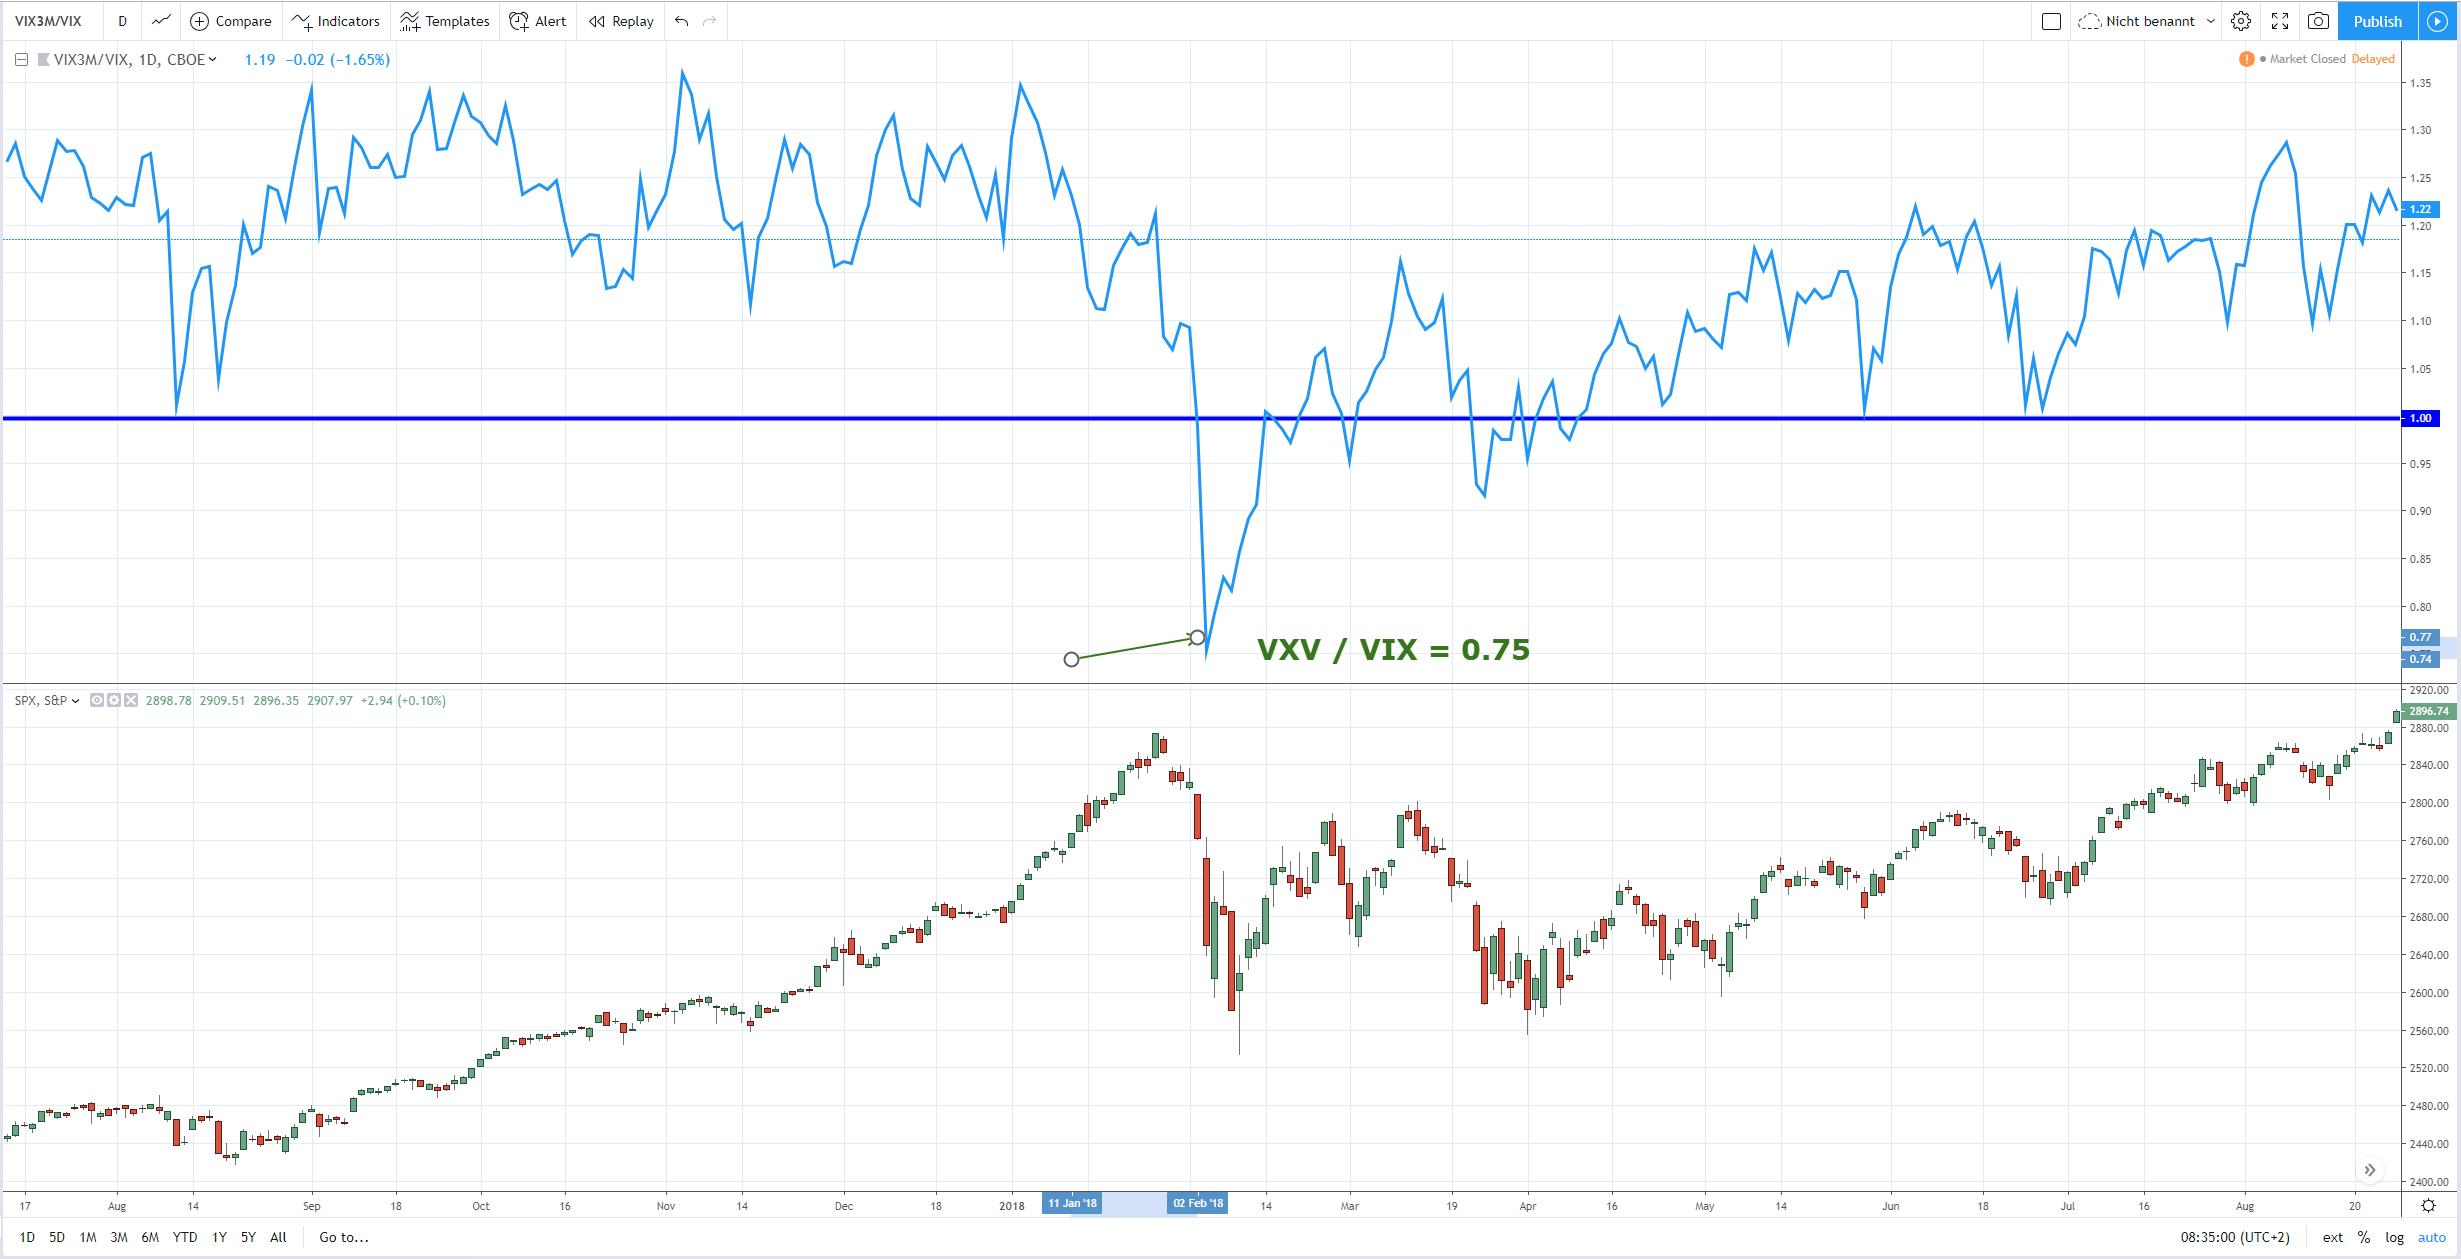 VXV-VIX-Ratio Beispiel Februar 2018